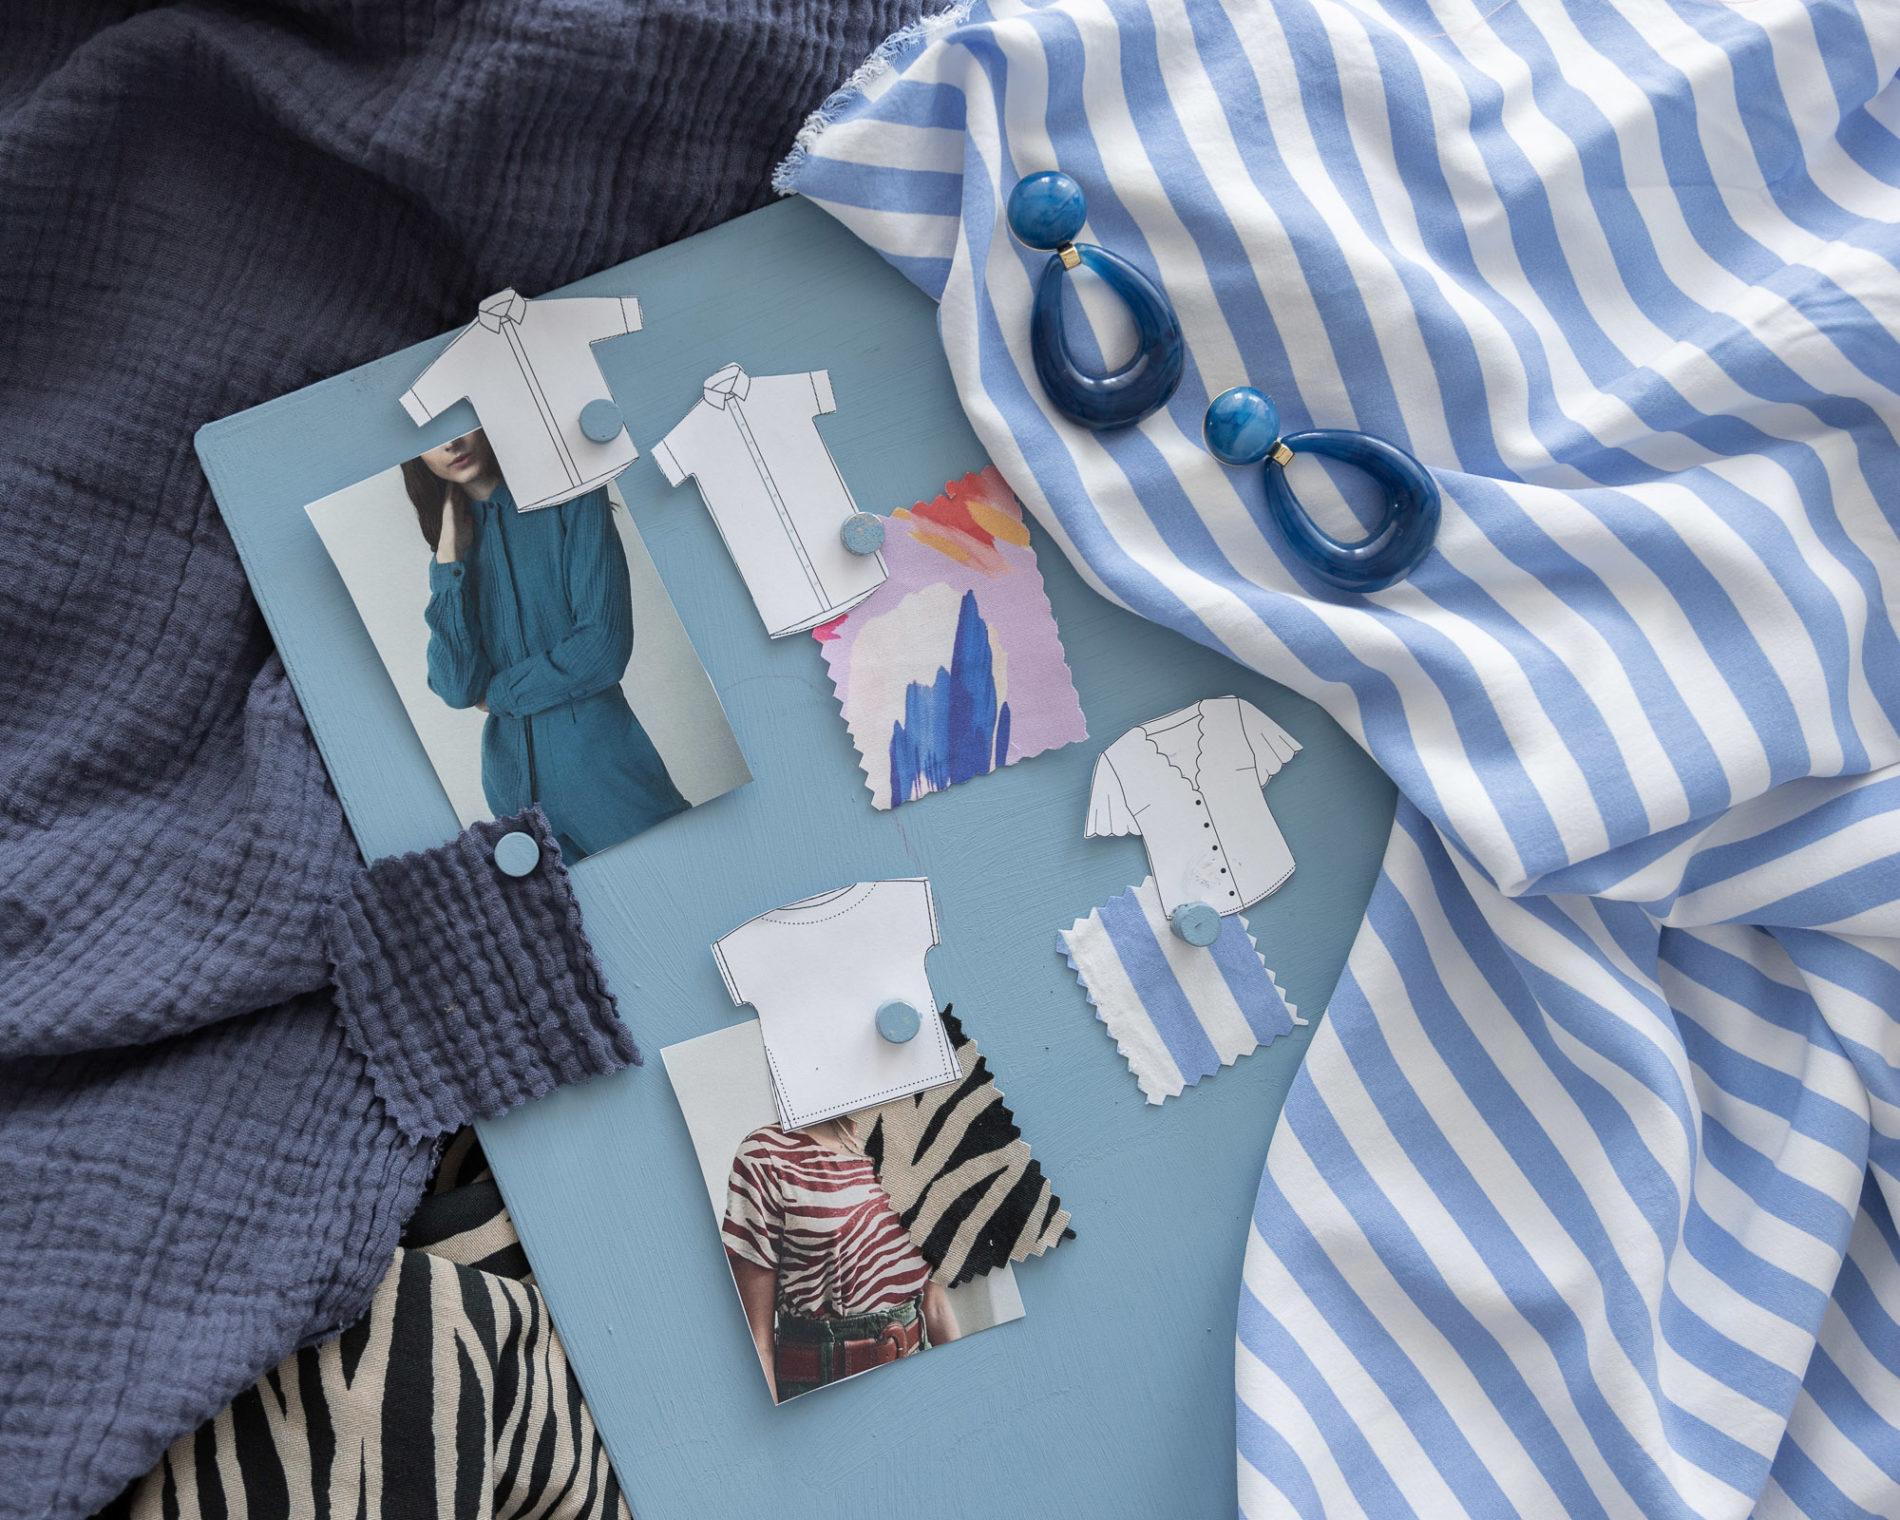 Capsule Wardrobe nähen -  Pläne für den Frühling - Tweed & Greet